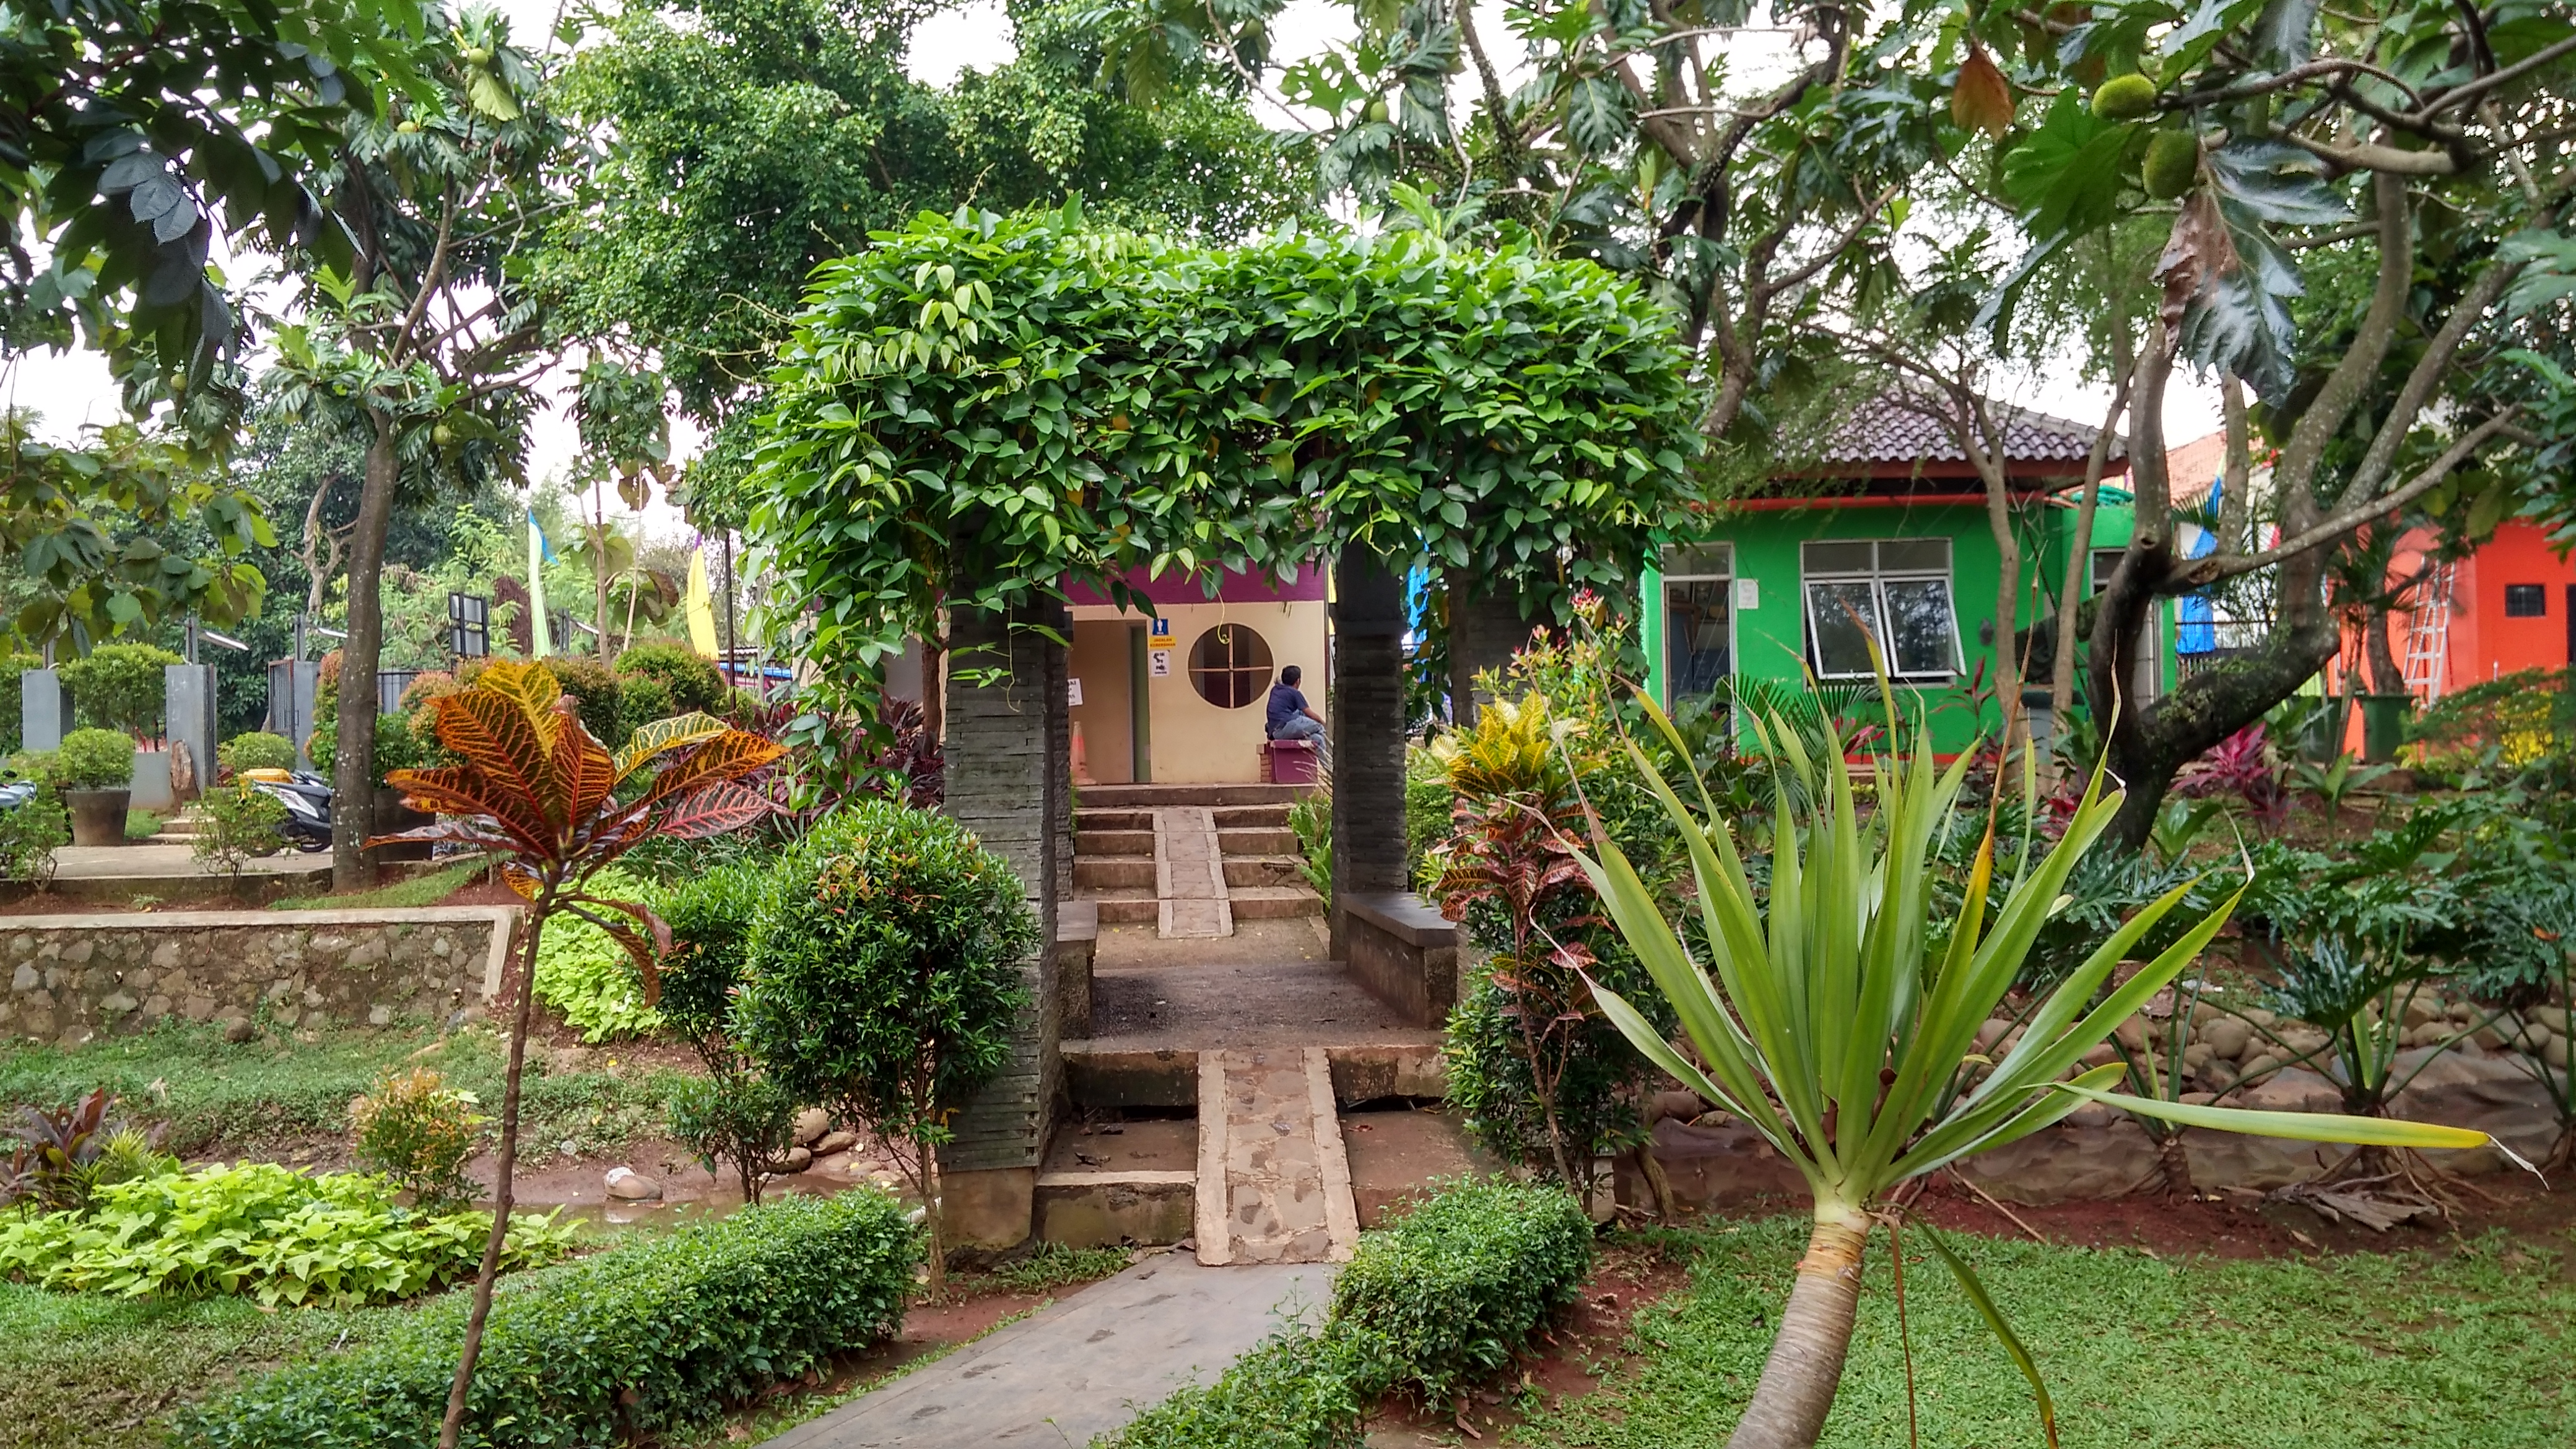 Sejarah Sarana Dan Prasarana Taman Lembah Gurame Depok Jawa